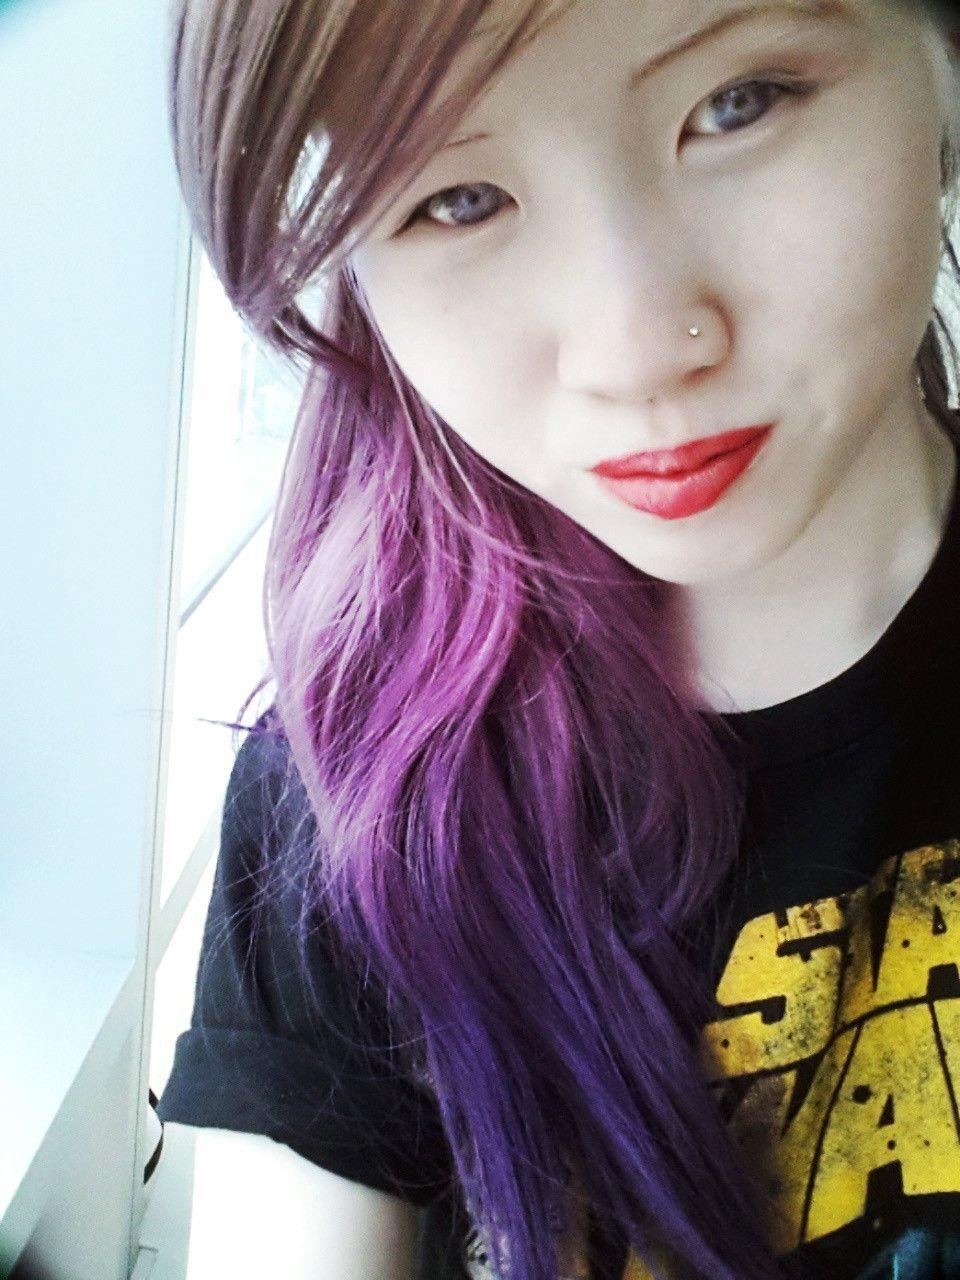 iama 21 year old asian girl with albinism. ama | bestofama | a